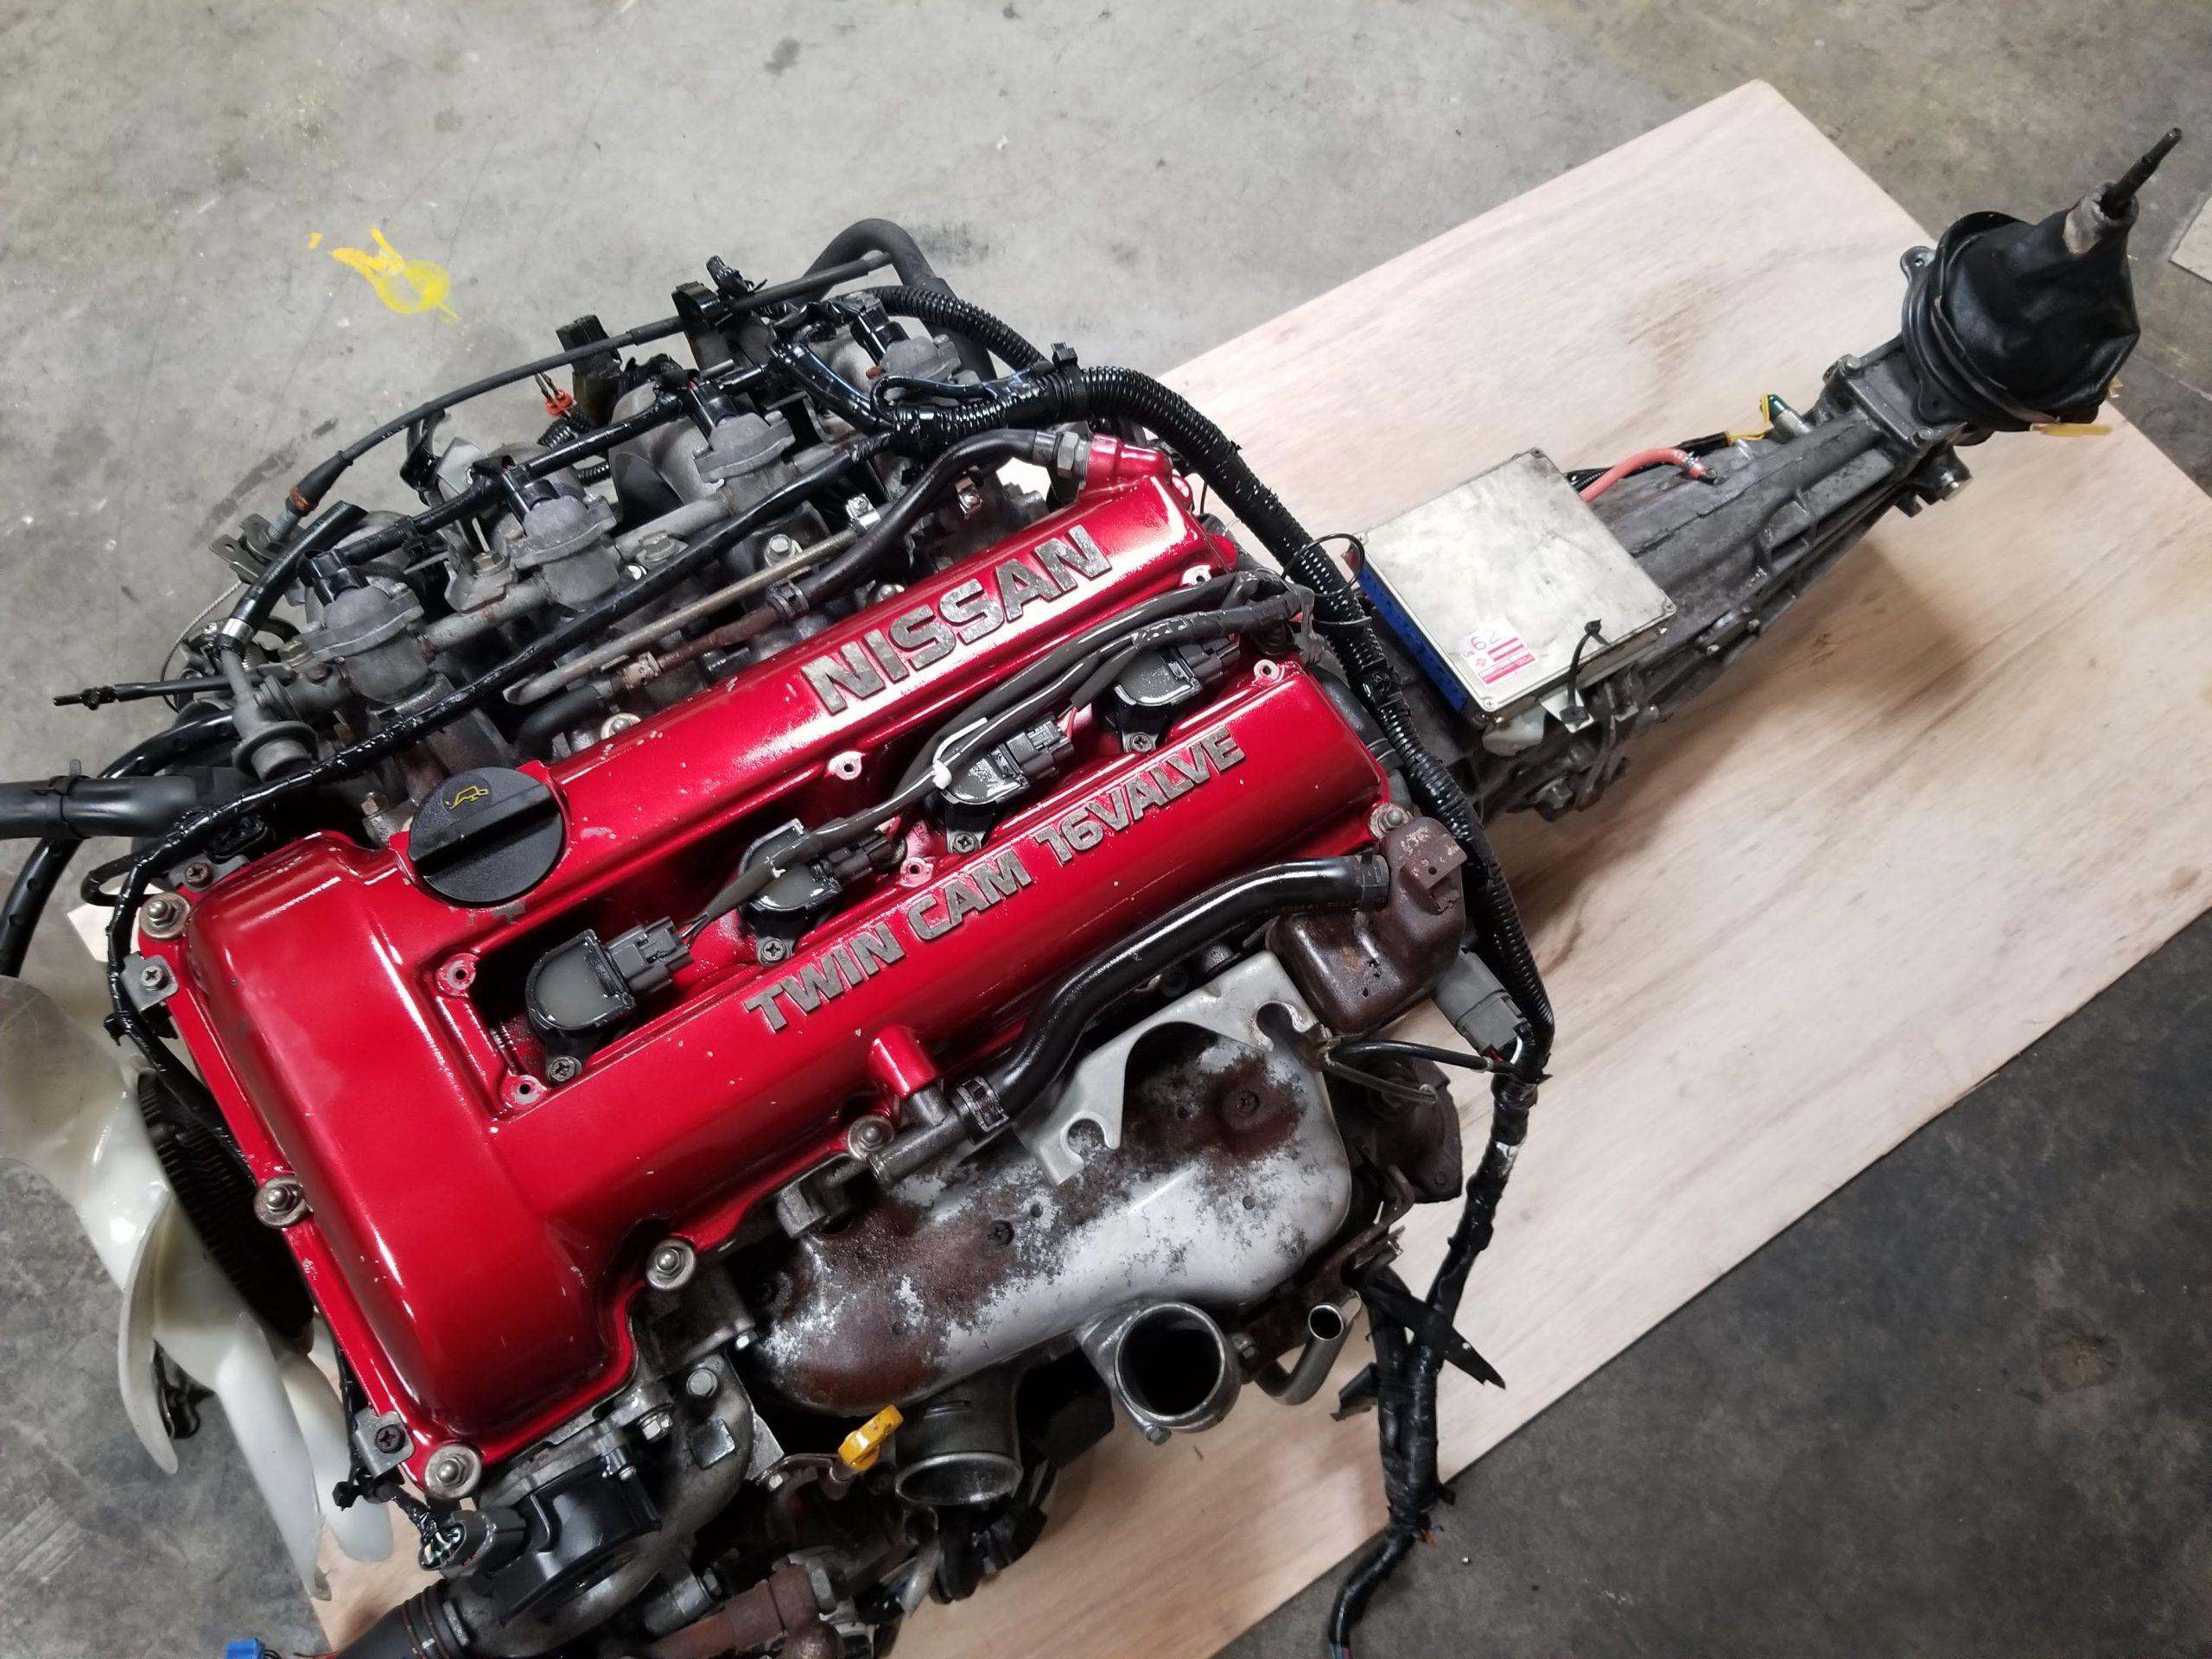 Sr20det S13 Red Top 2 0l Turbo Engine With 5 Speed Manual Transmission Nissan 200sx 240sx Silvia Sr20 Jdm Of San Diego